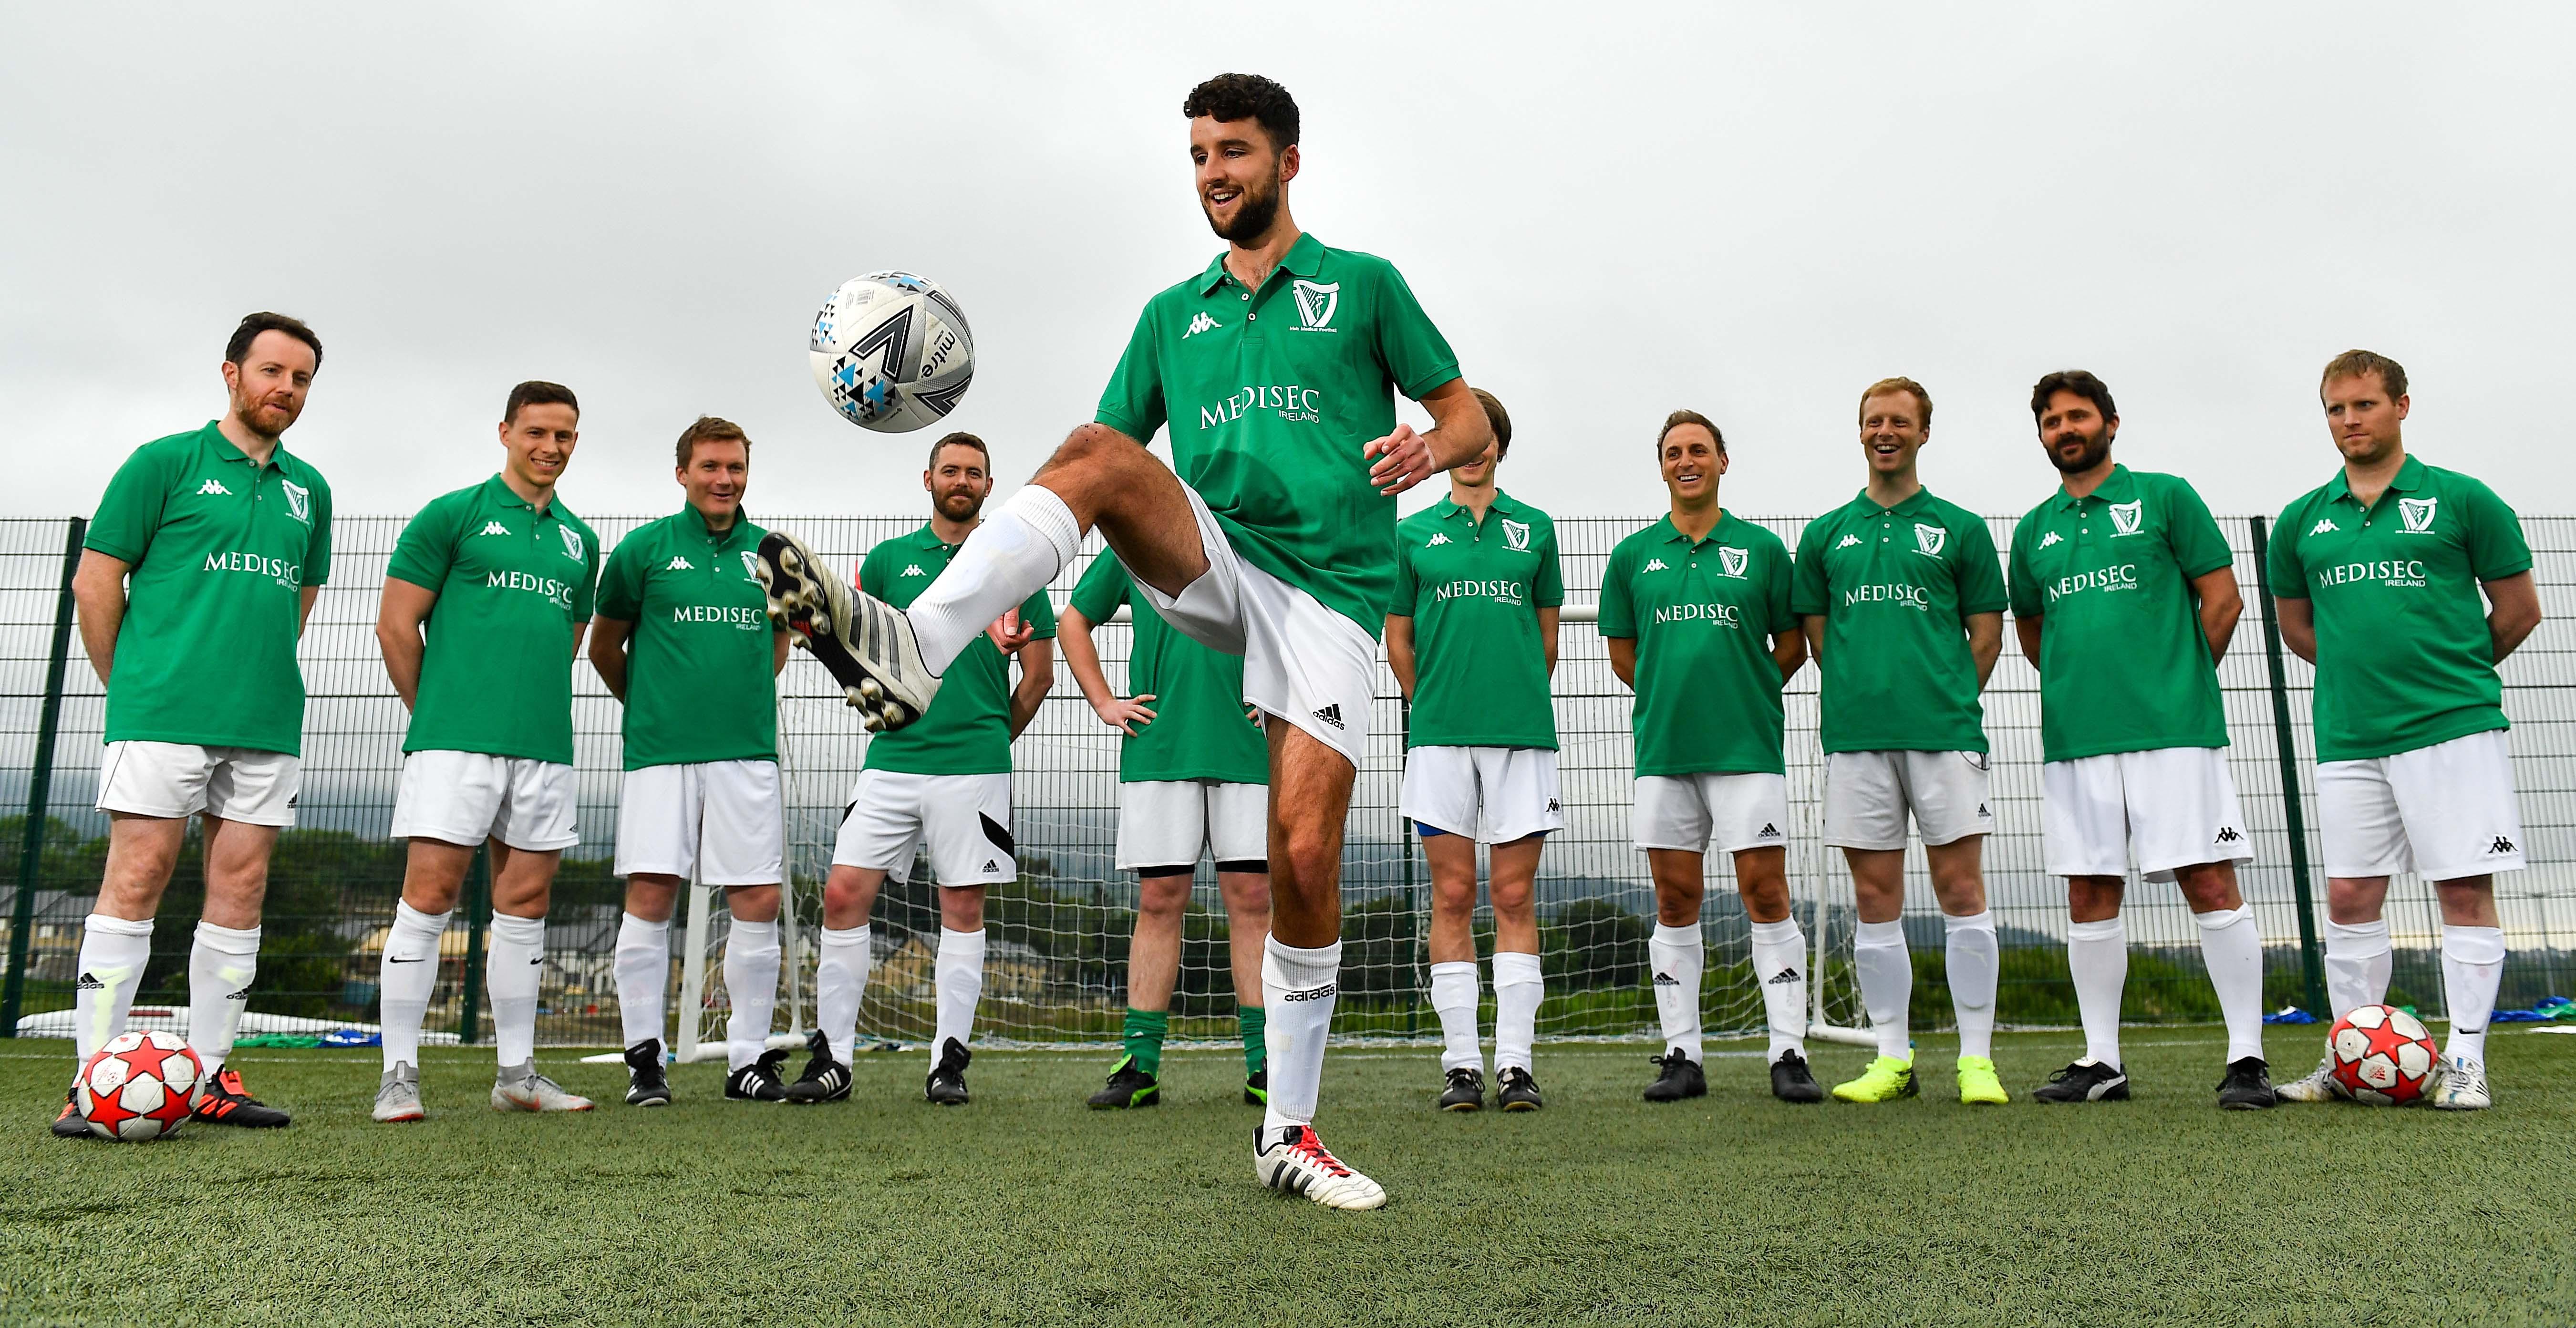 24 June 2019; The launch of the Irish Medical Football Kit at Wayside Celtic in Kiltiernan, Co. Dublin. Photo by Brendan Moran/Sportsfile *** NO REPRODUCTION FEE ***